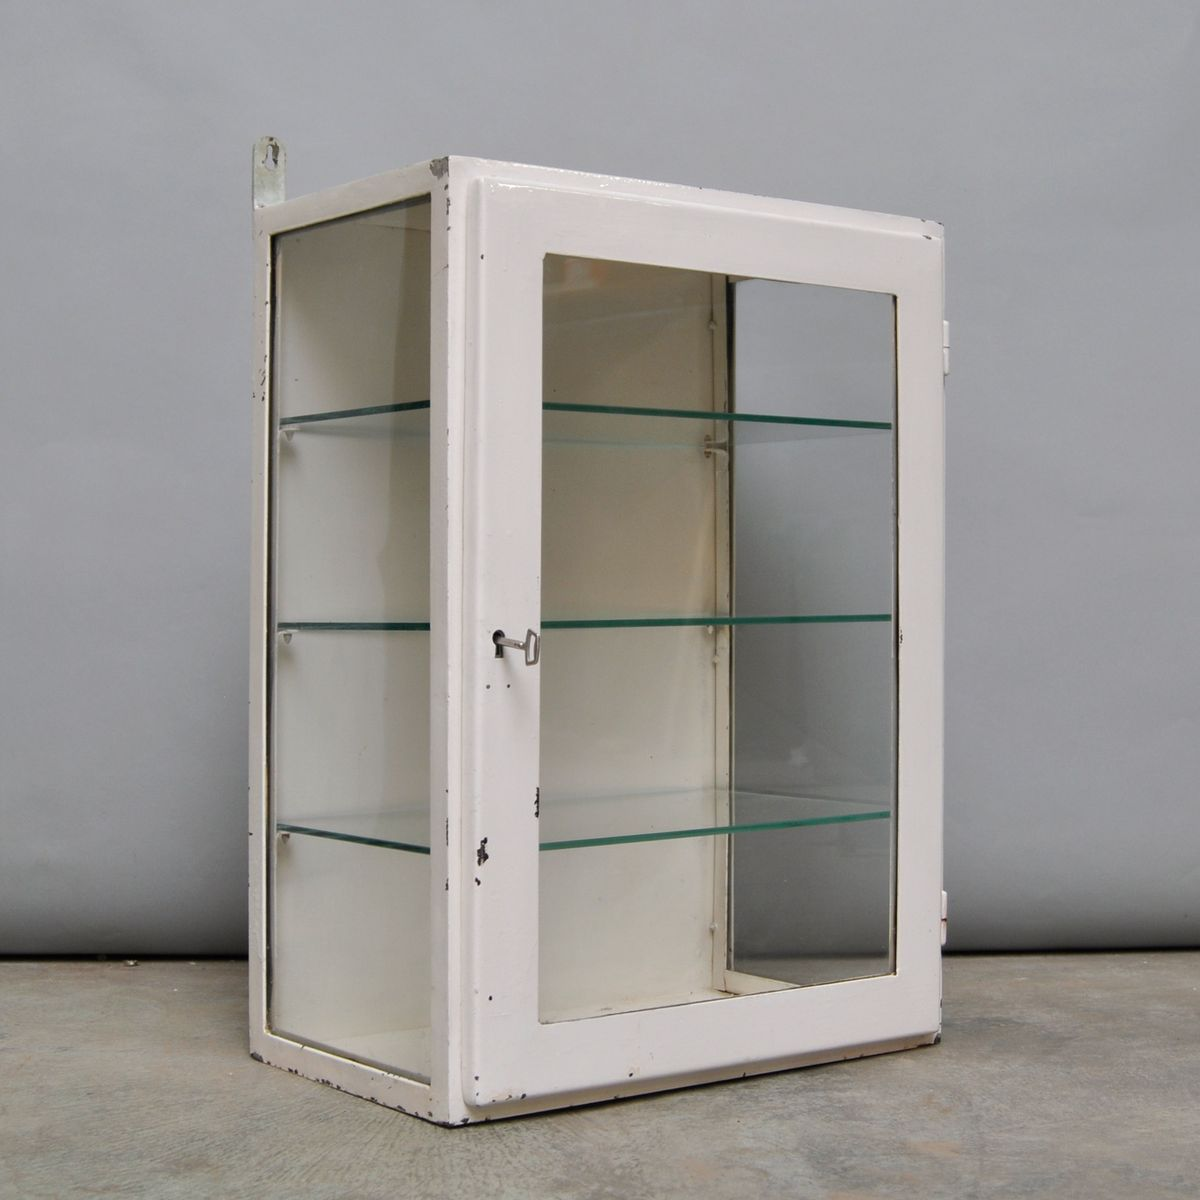 Petit meuble de rangement medical suspendu 1960s en vente - Meuble de rangement suspendu ...